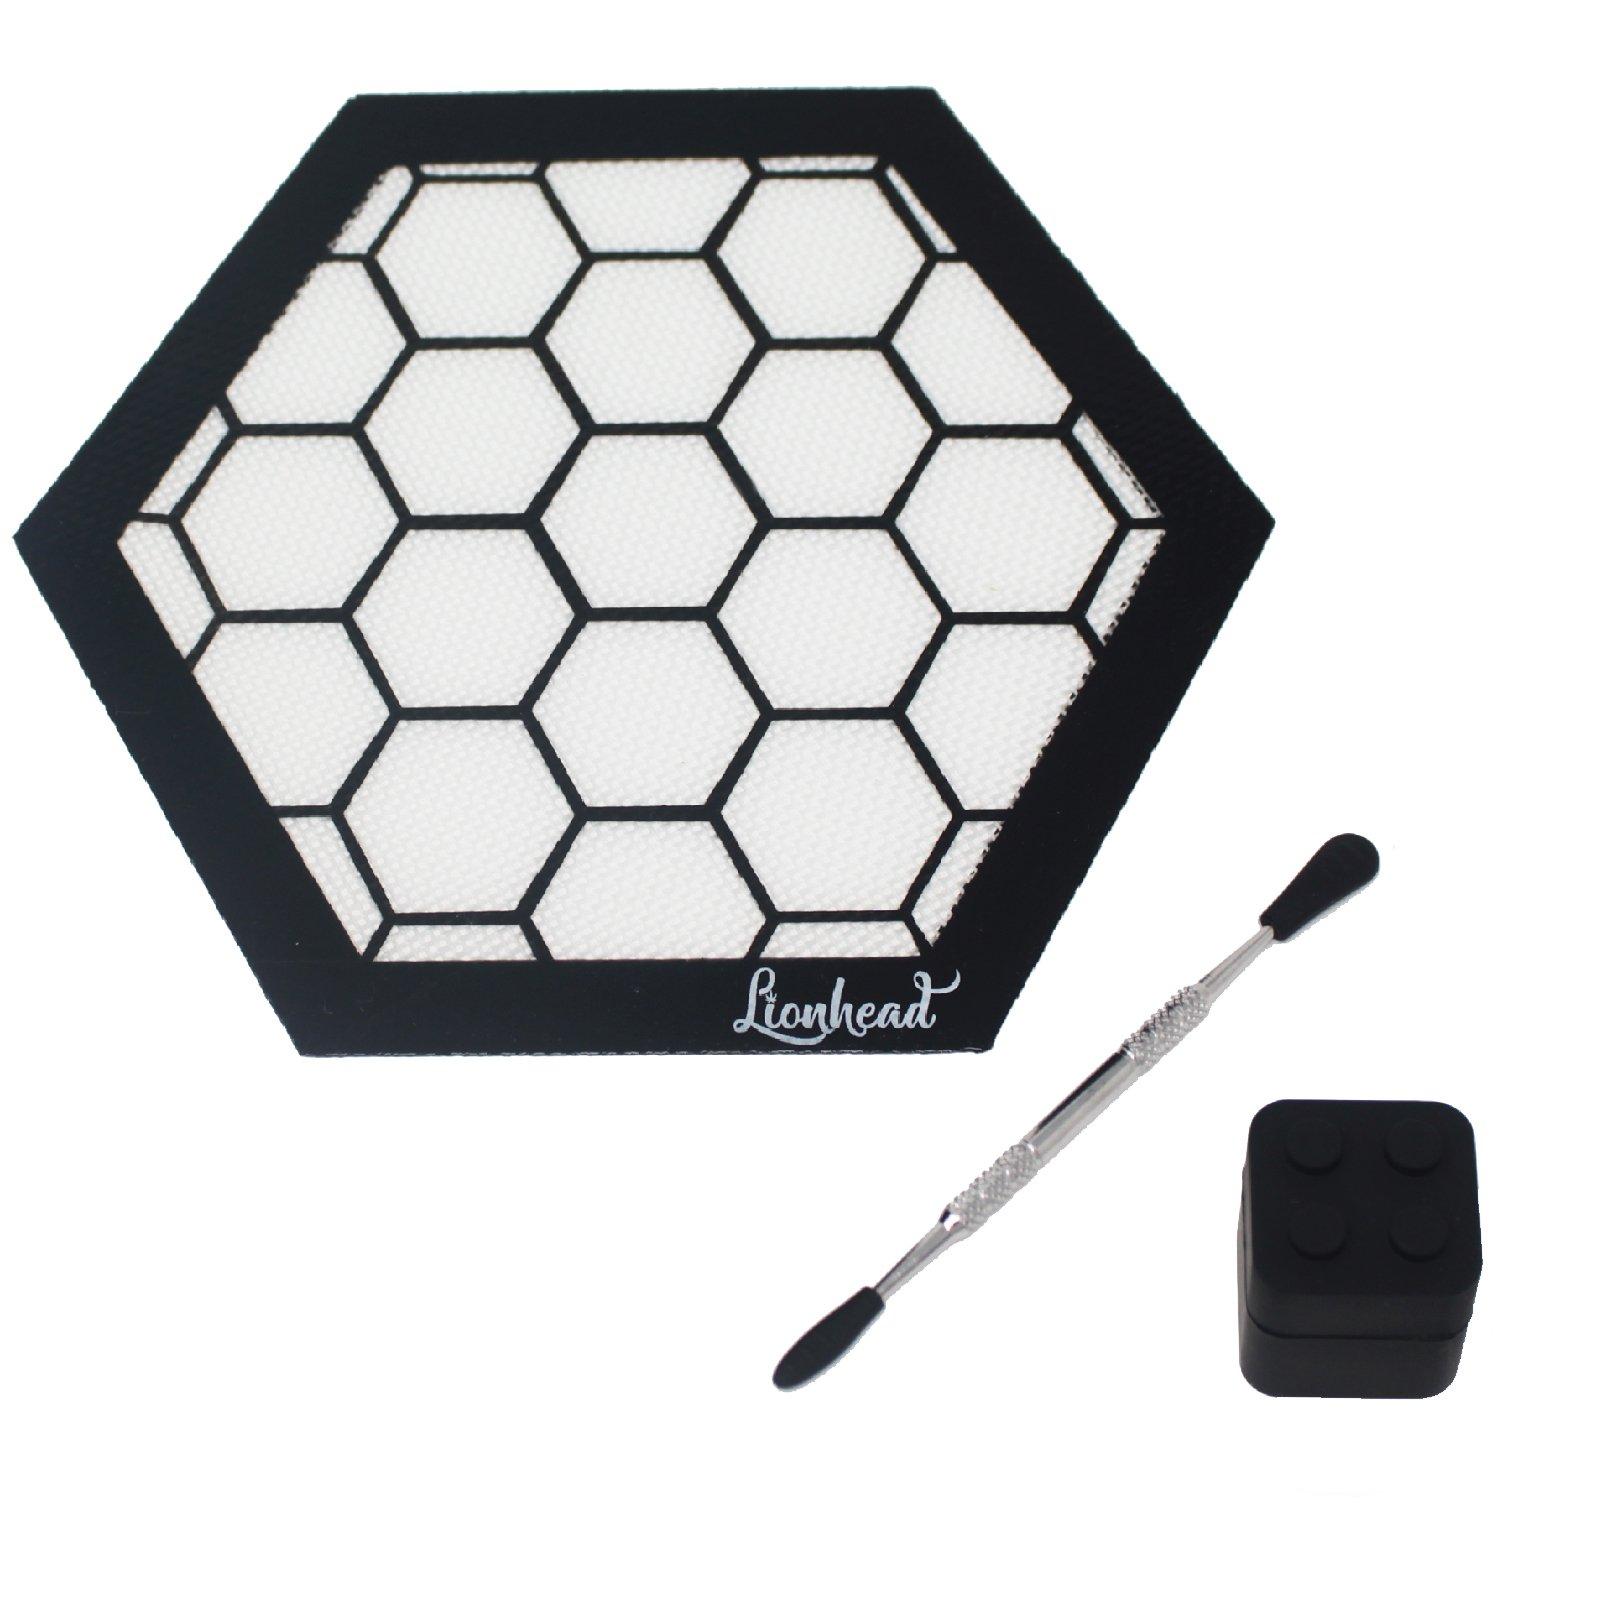 "Silicone Mat Bundle - 8"" Hexagon Mat + 5"" Carving Tool + 7ml Non-Stick Container + Sponge - Lionhead (Honeycomb)"